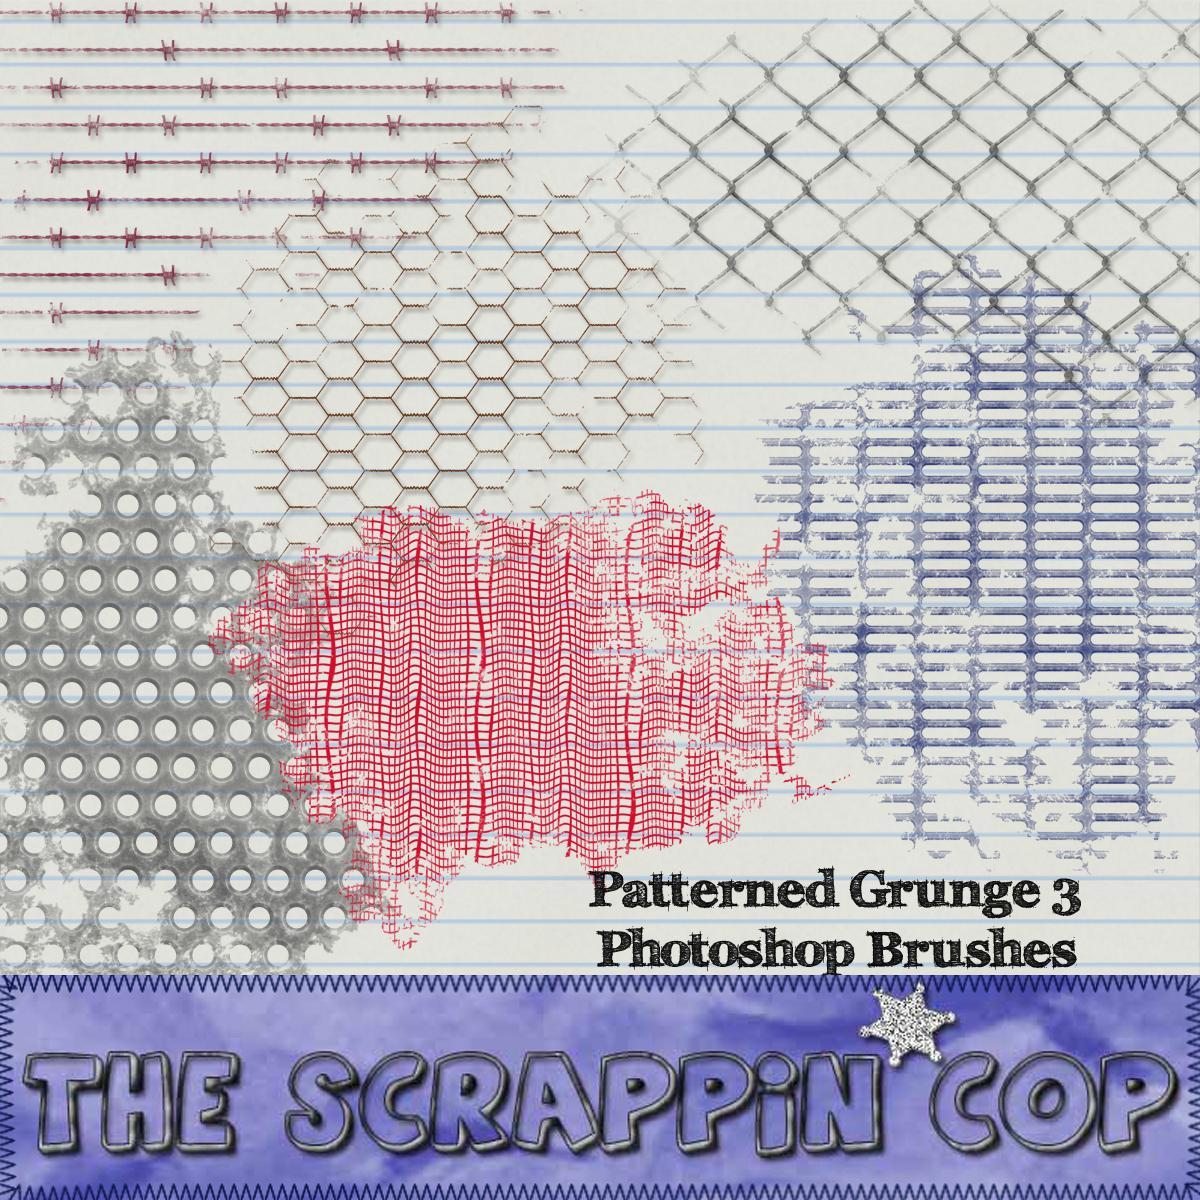 Patterned Grunge Set 3 by debh945